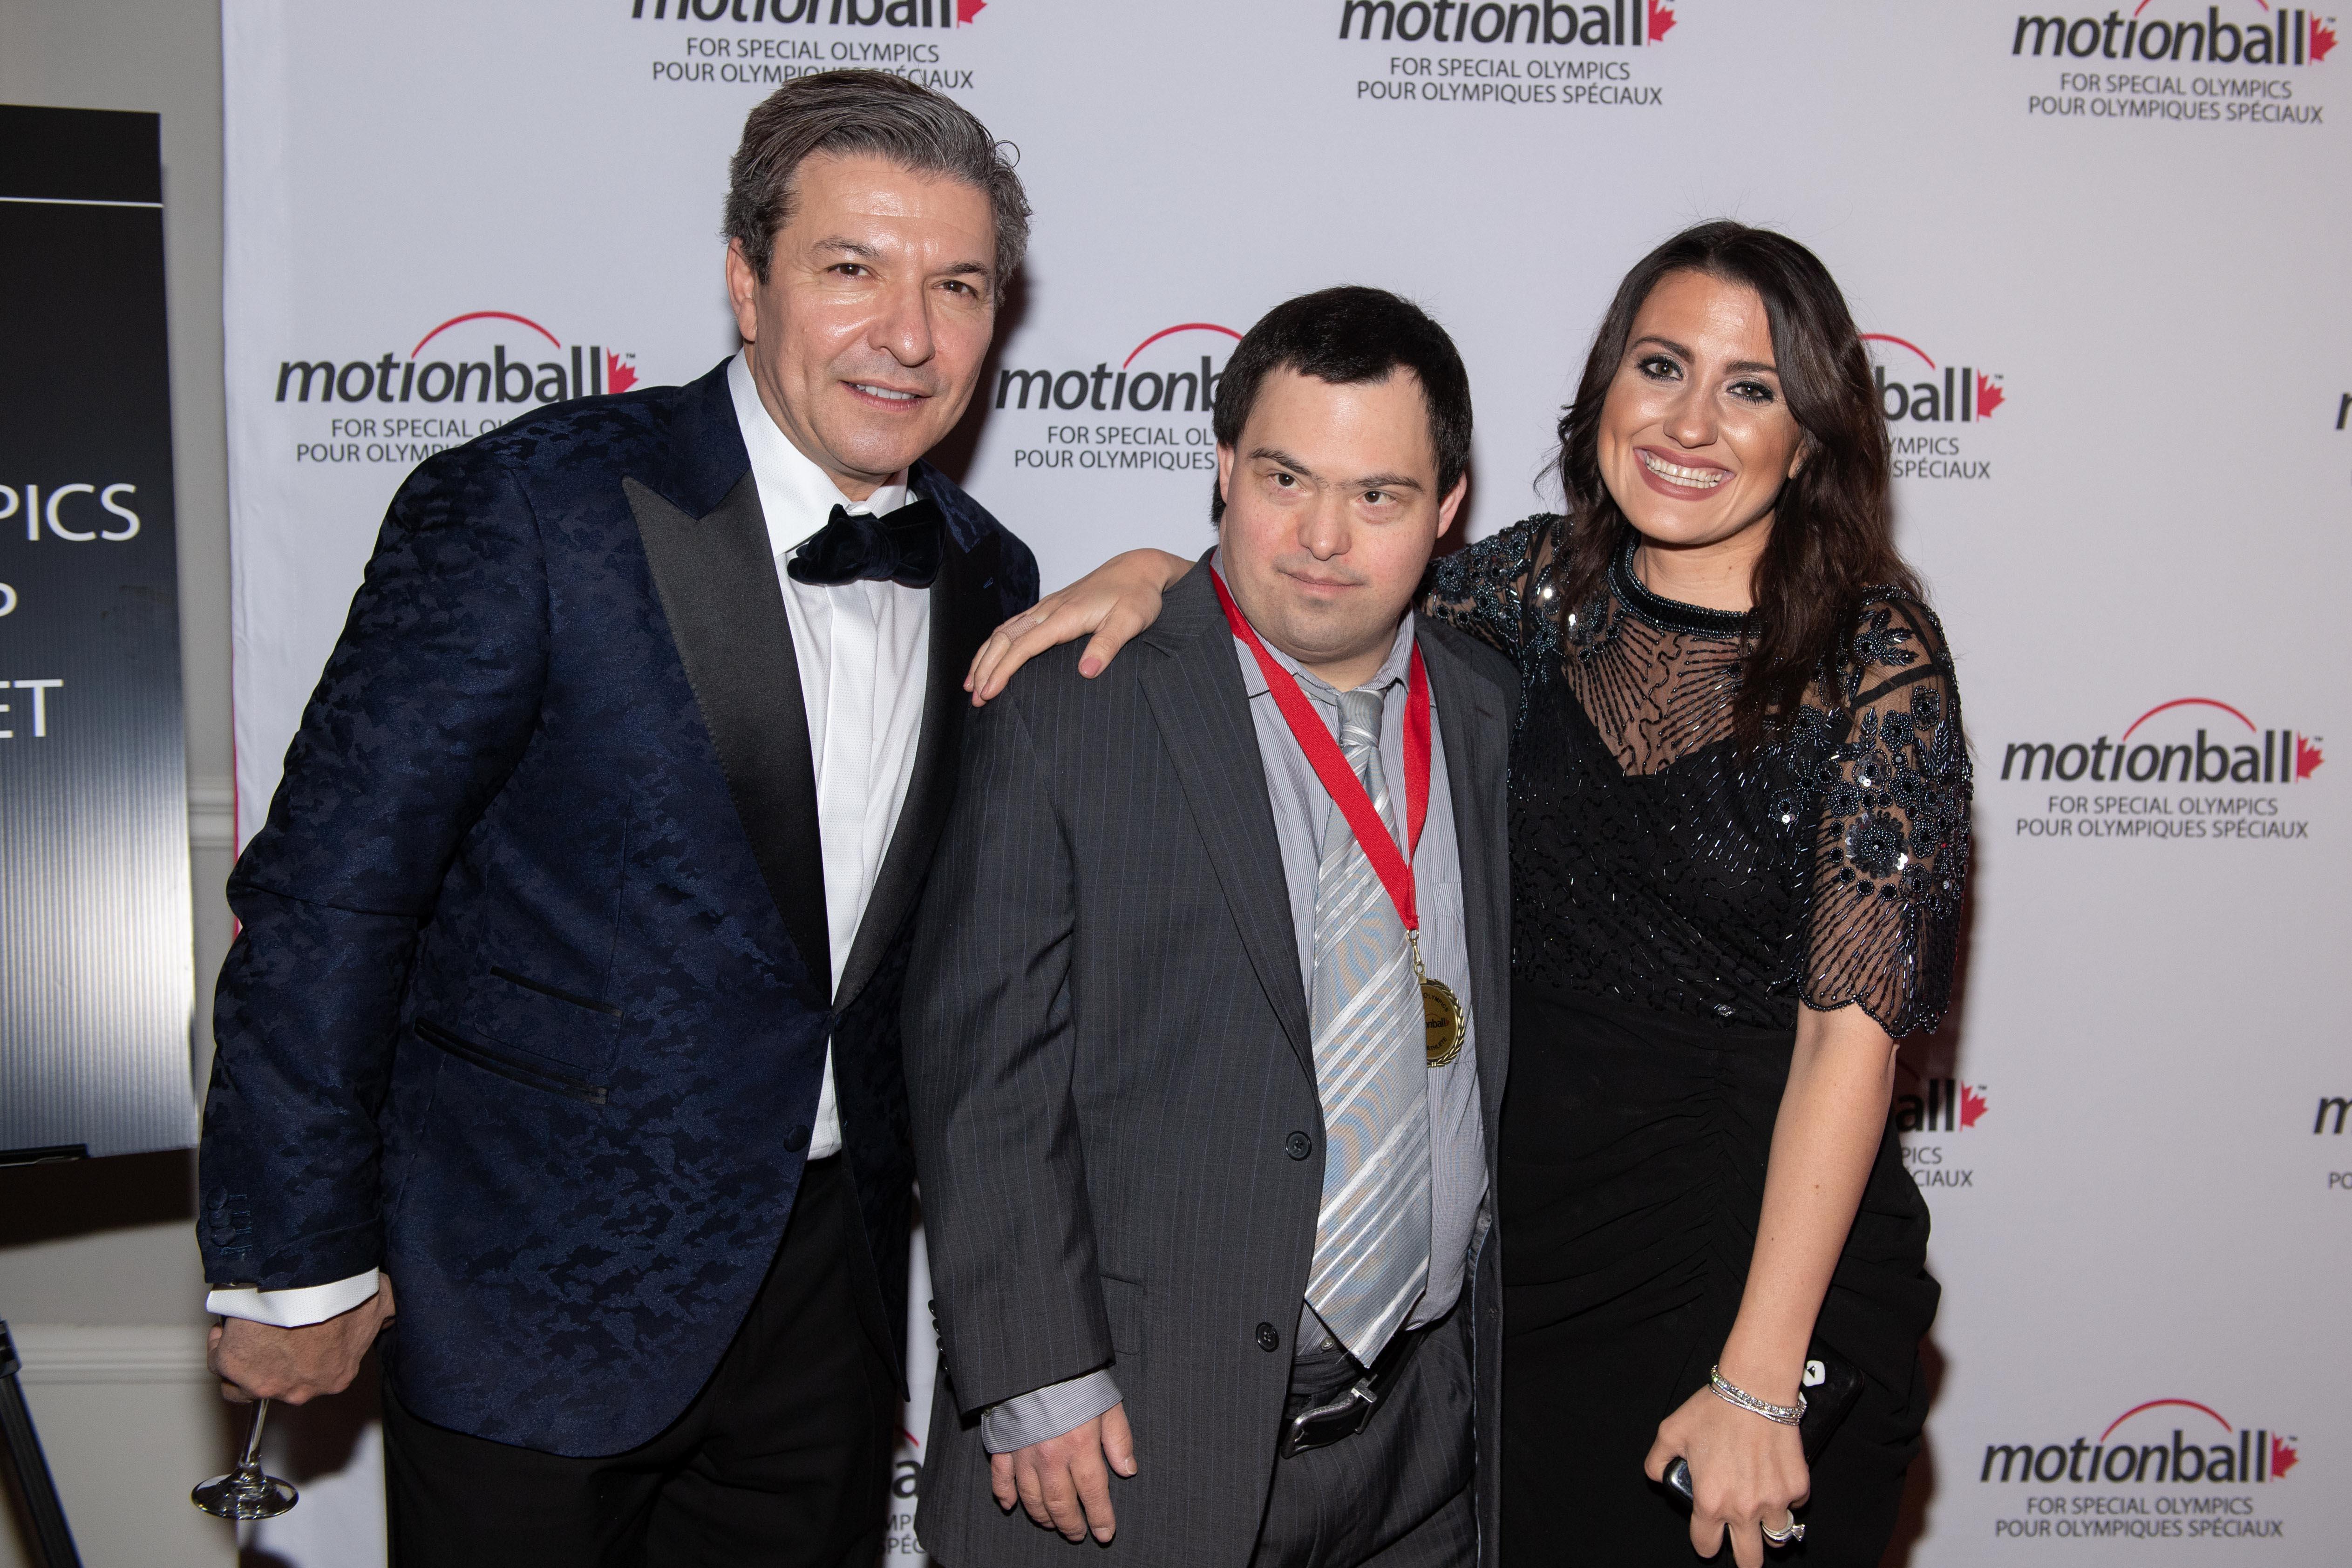 Anthony Primerano, Matthew Hoffman, and Victoria Mancinelli